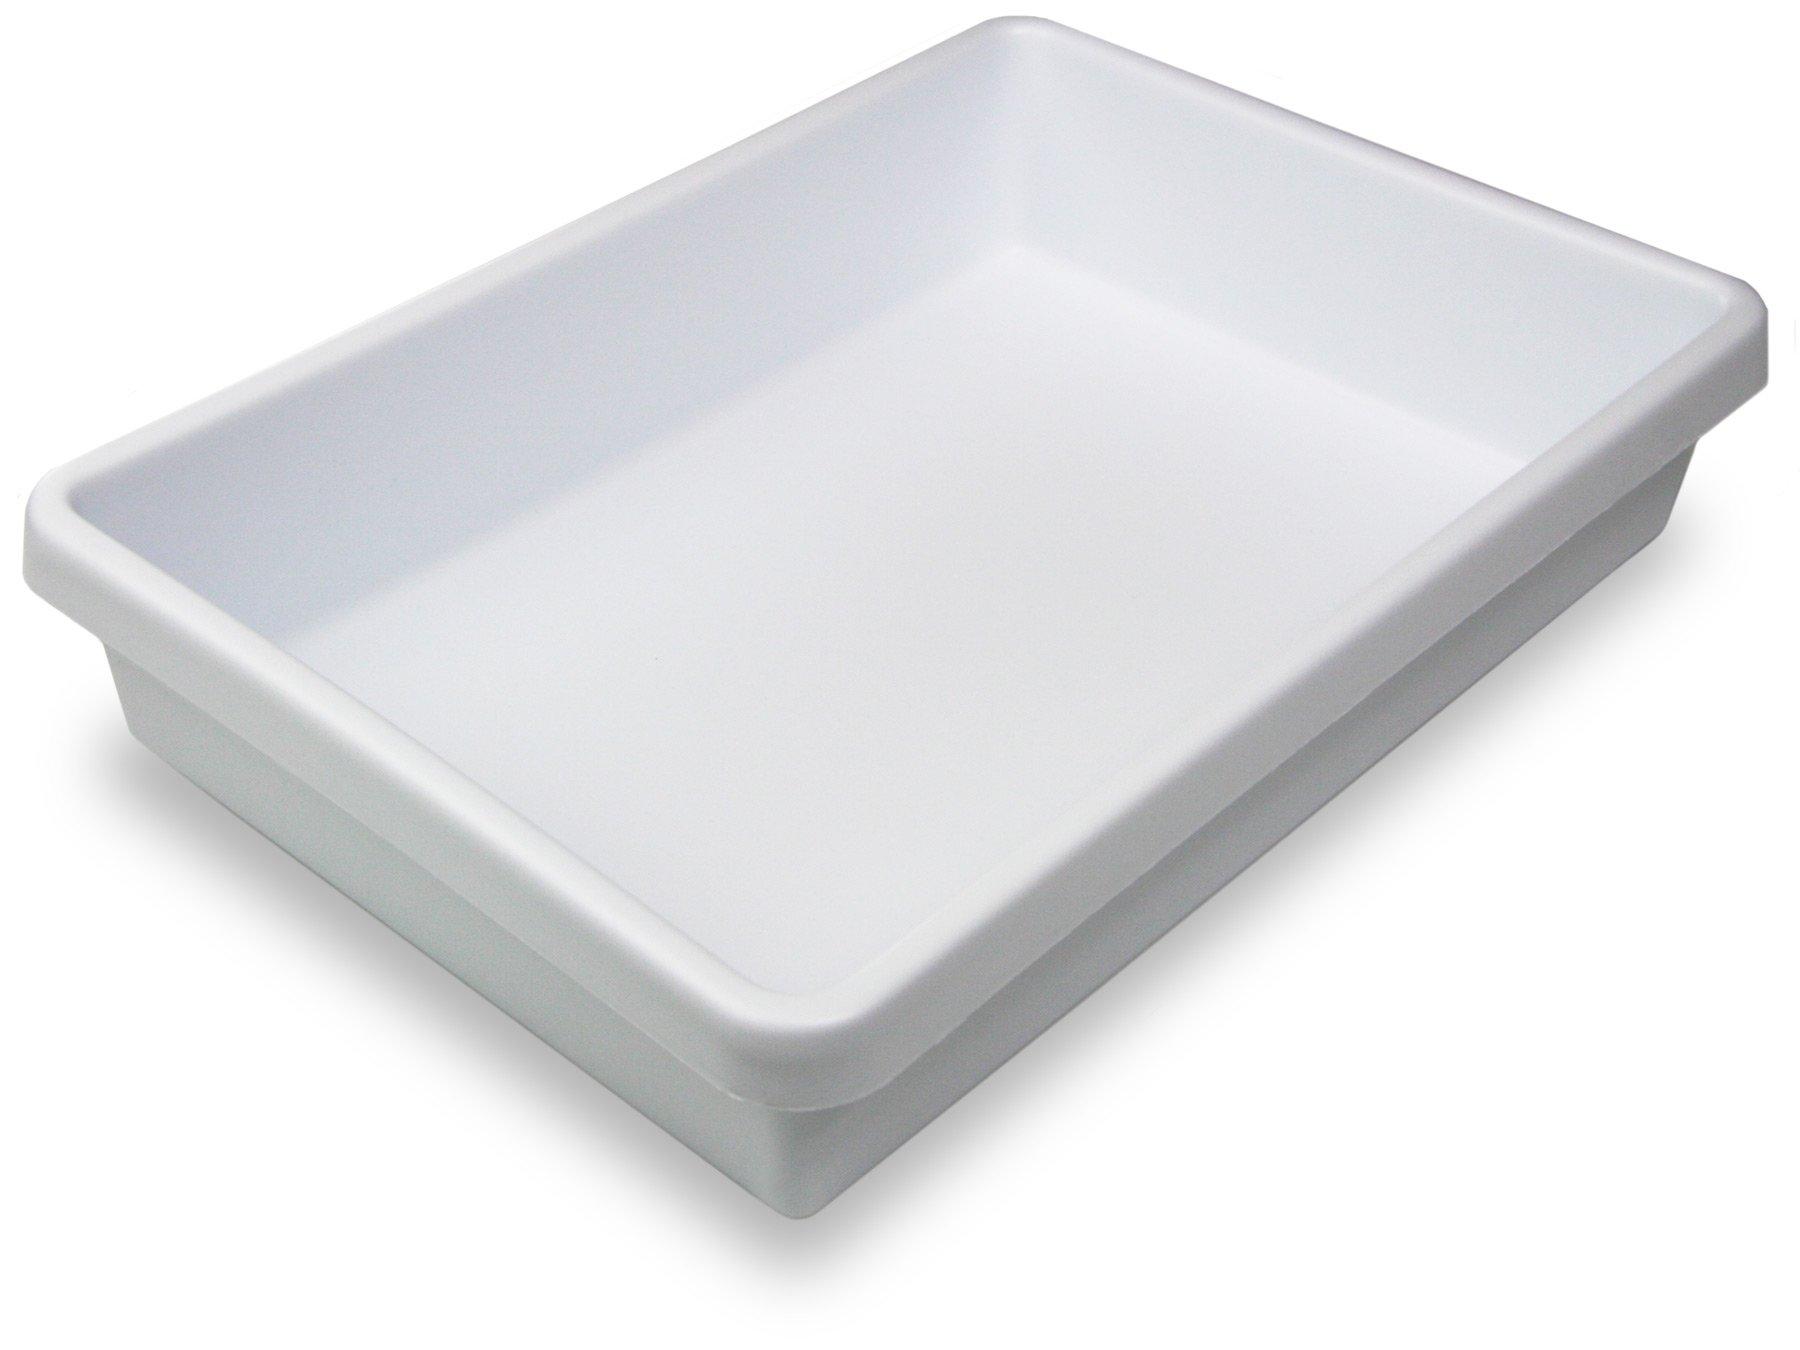 "TrippNT 50424 White Polystyrene Plastic Drawer Organizer, 1 Pocket: 14"" Width x 3"" Height x 10"" Depth"